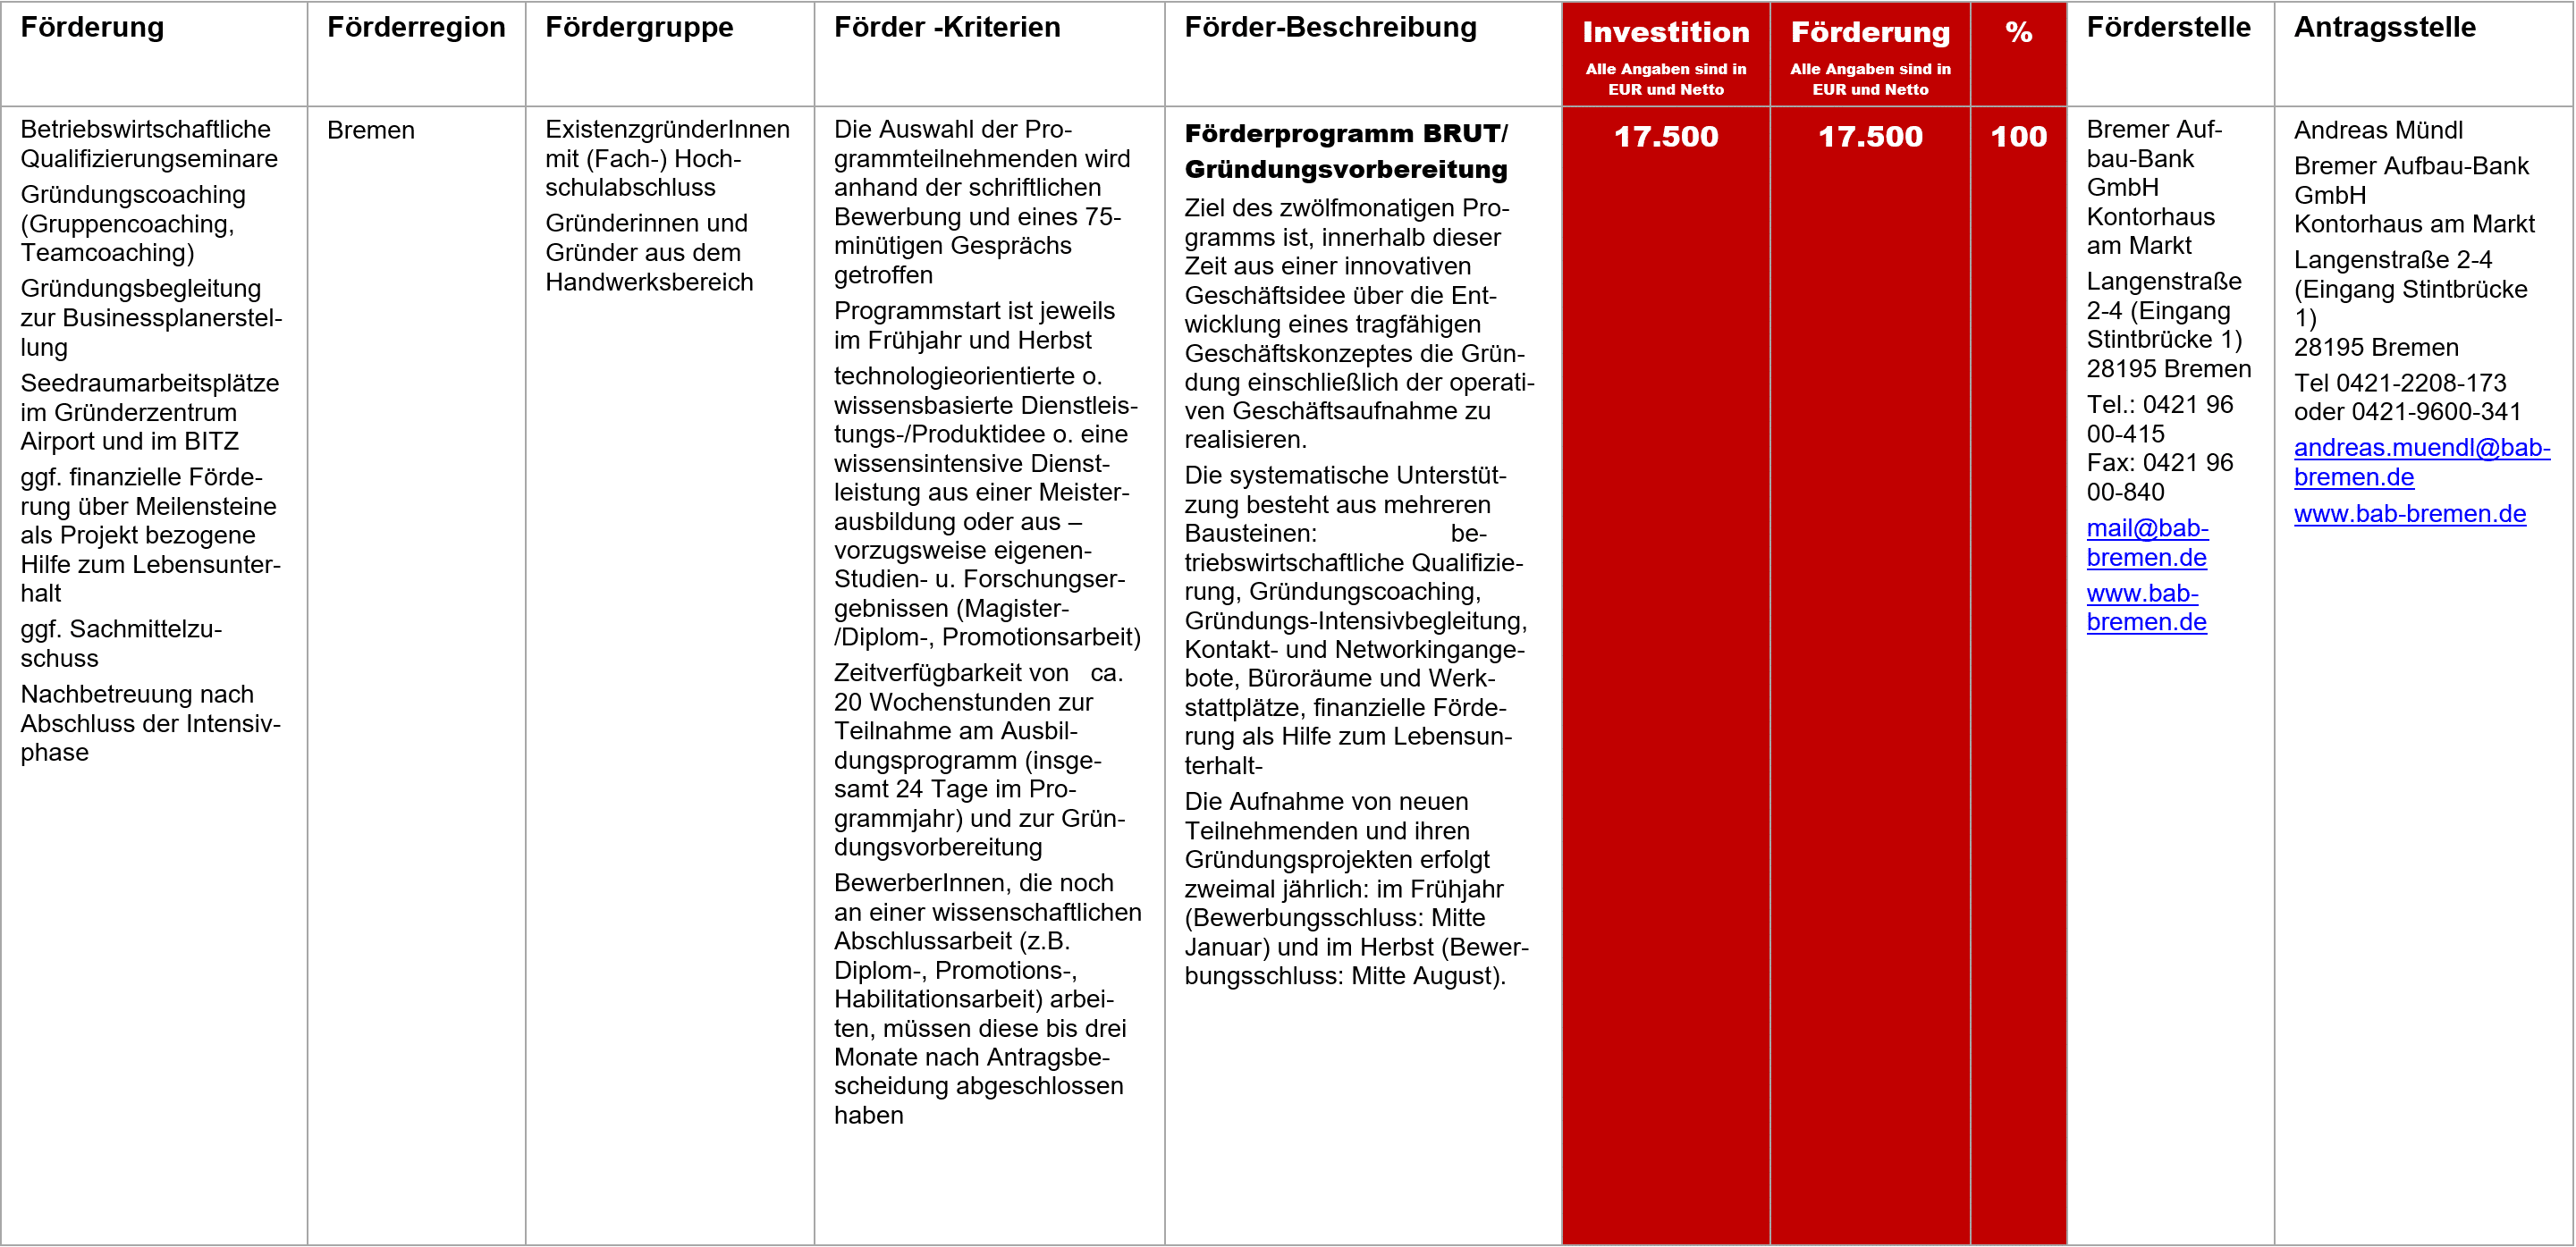 BRUT Gründungsvorbereitung, Fördermittel – BRUT/ Gründungsvorbereitung